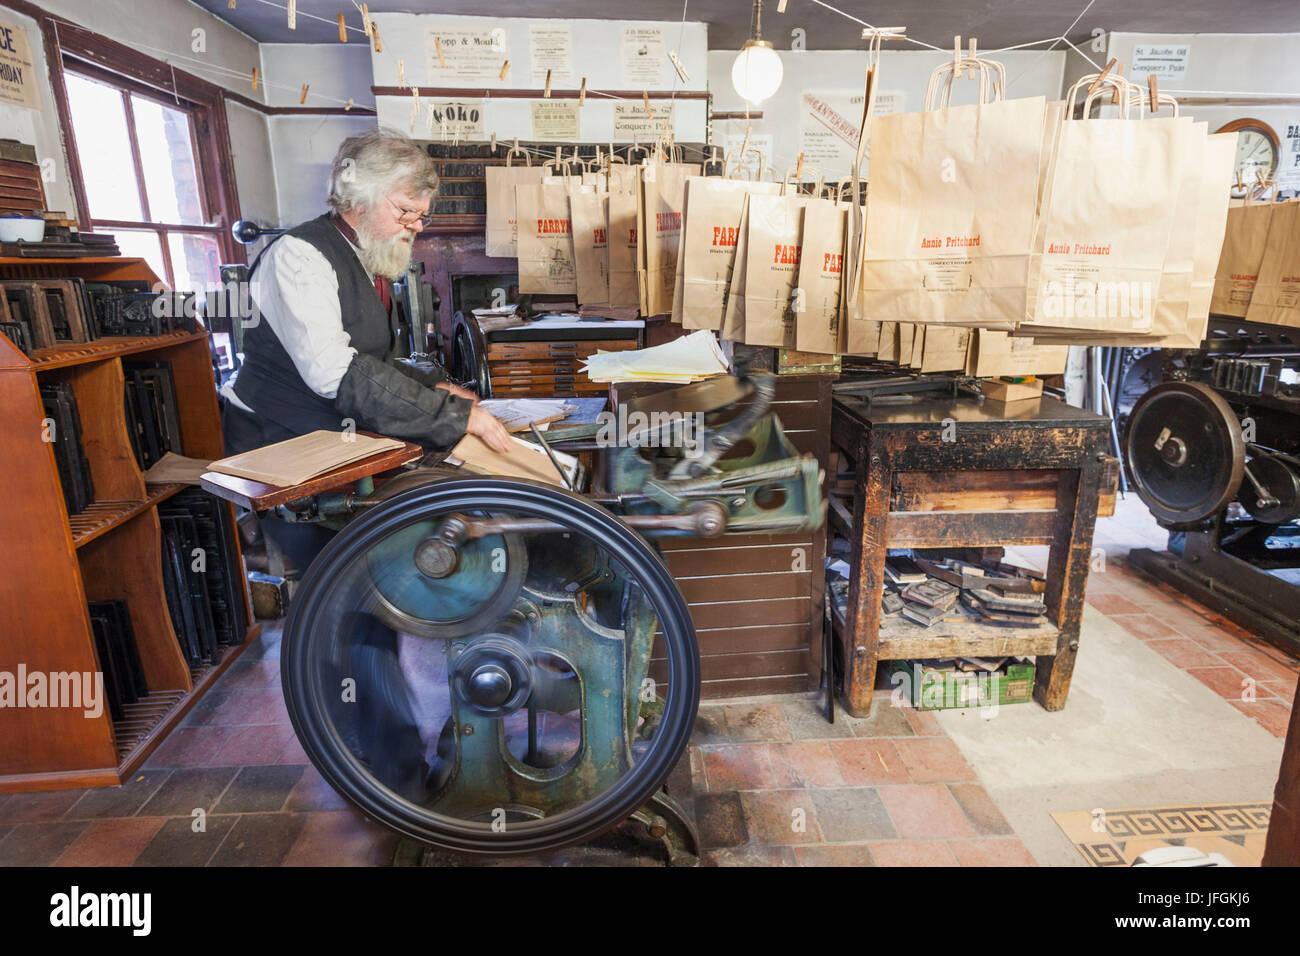 England, Shropshire, Ironbridge, Blists Hill Victorian Town, Historical Printing Machine Demonstration - Stock Image